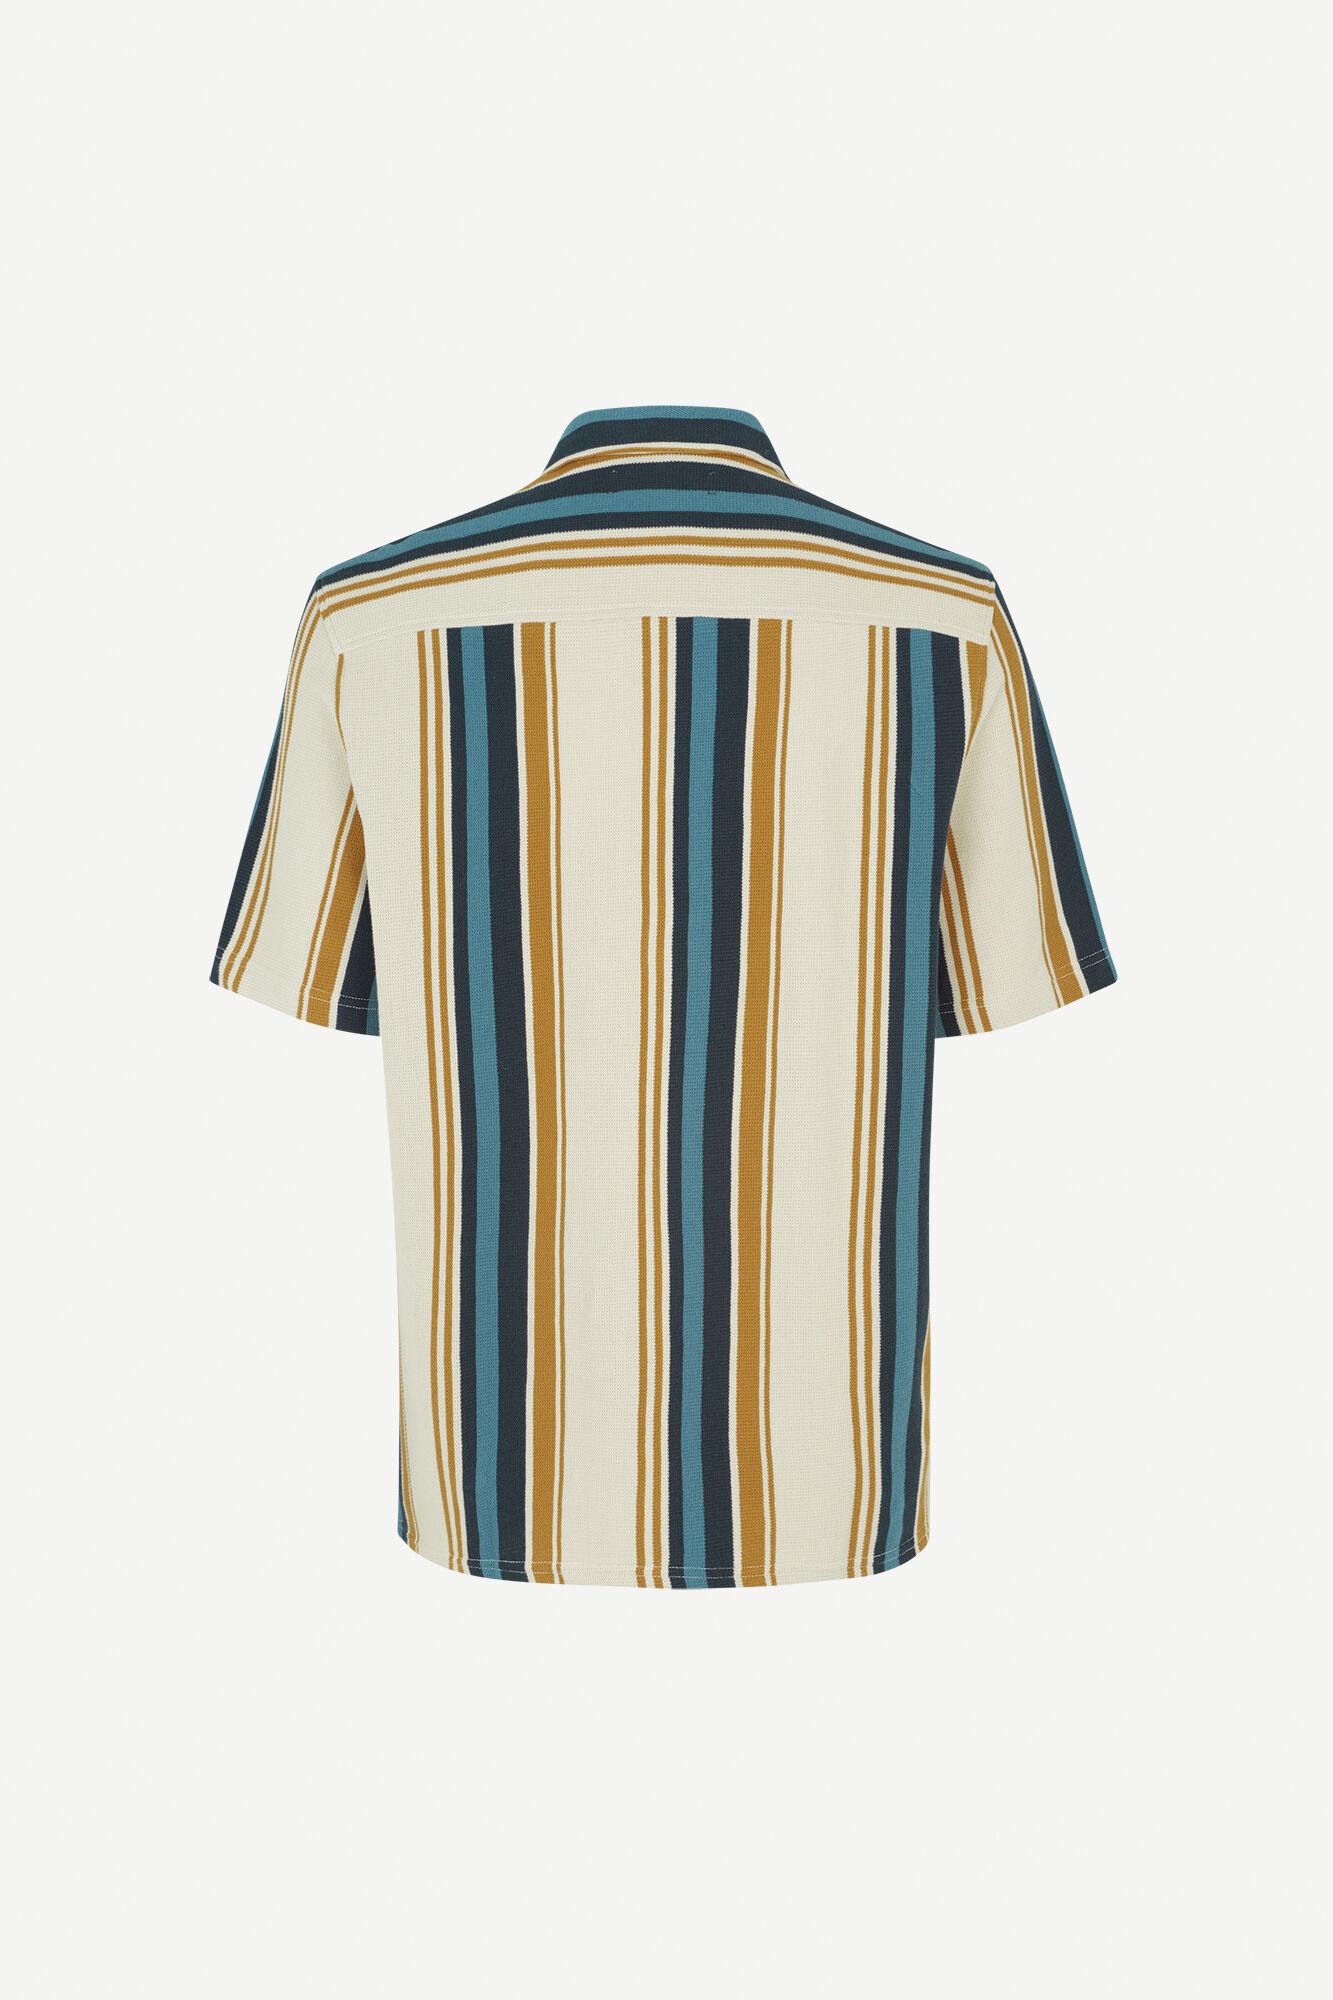 Kvistbro shirt st 11565